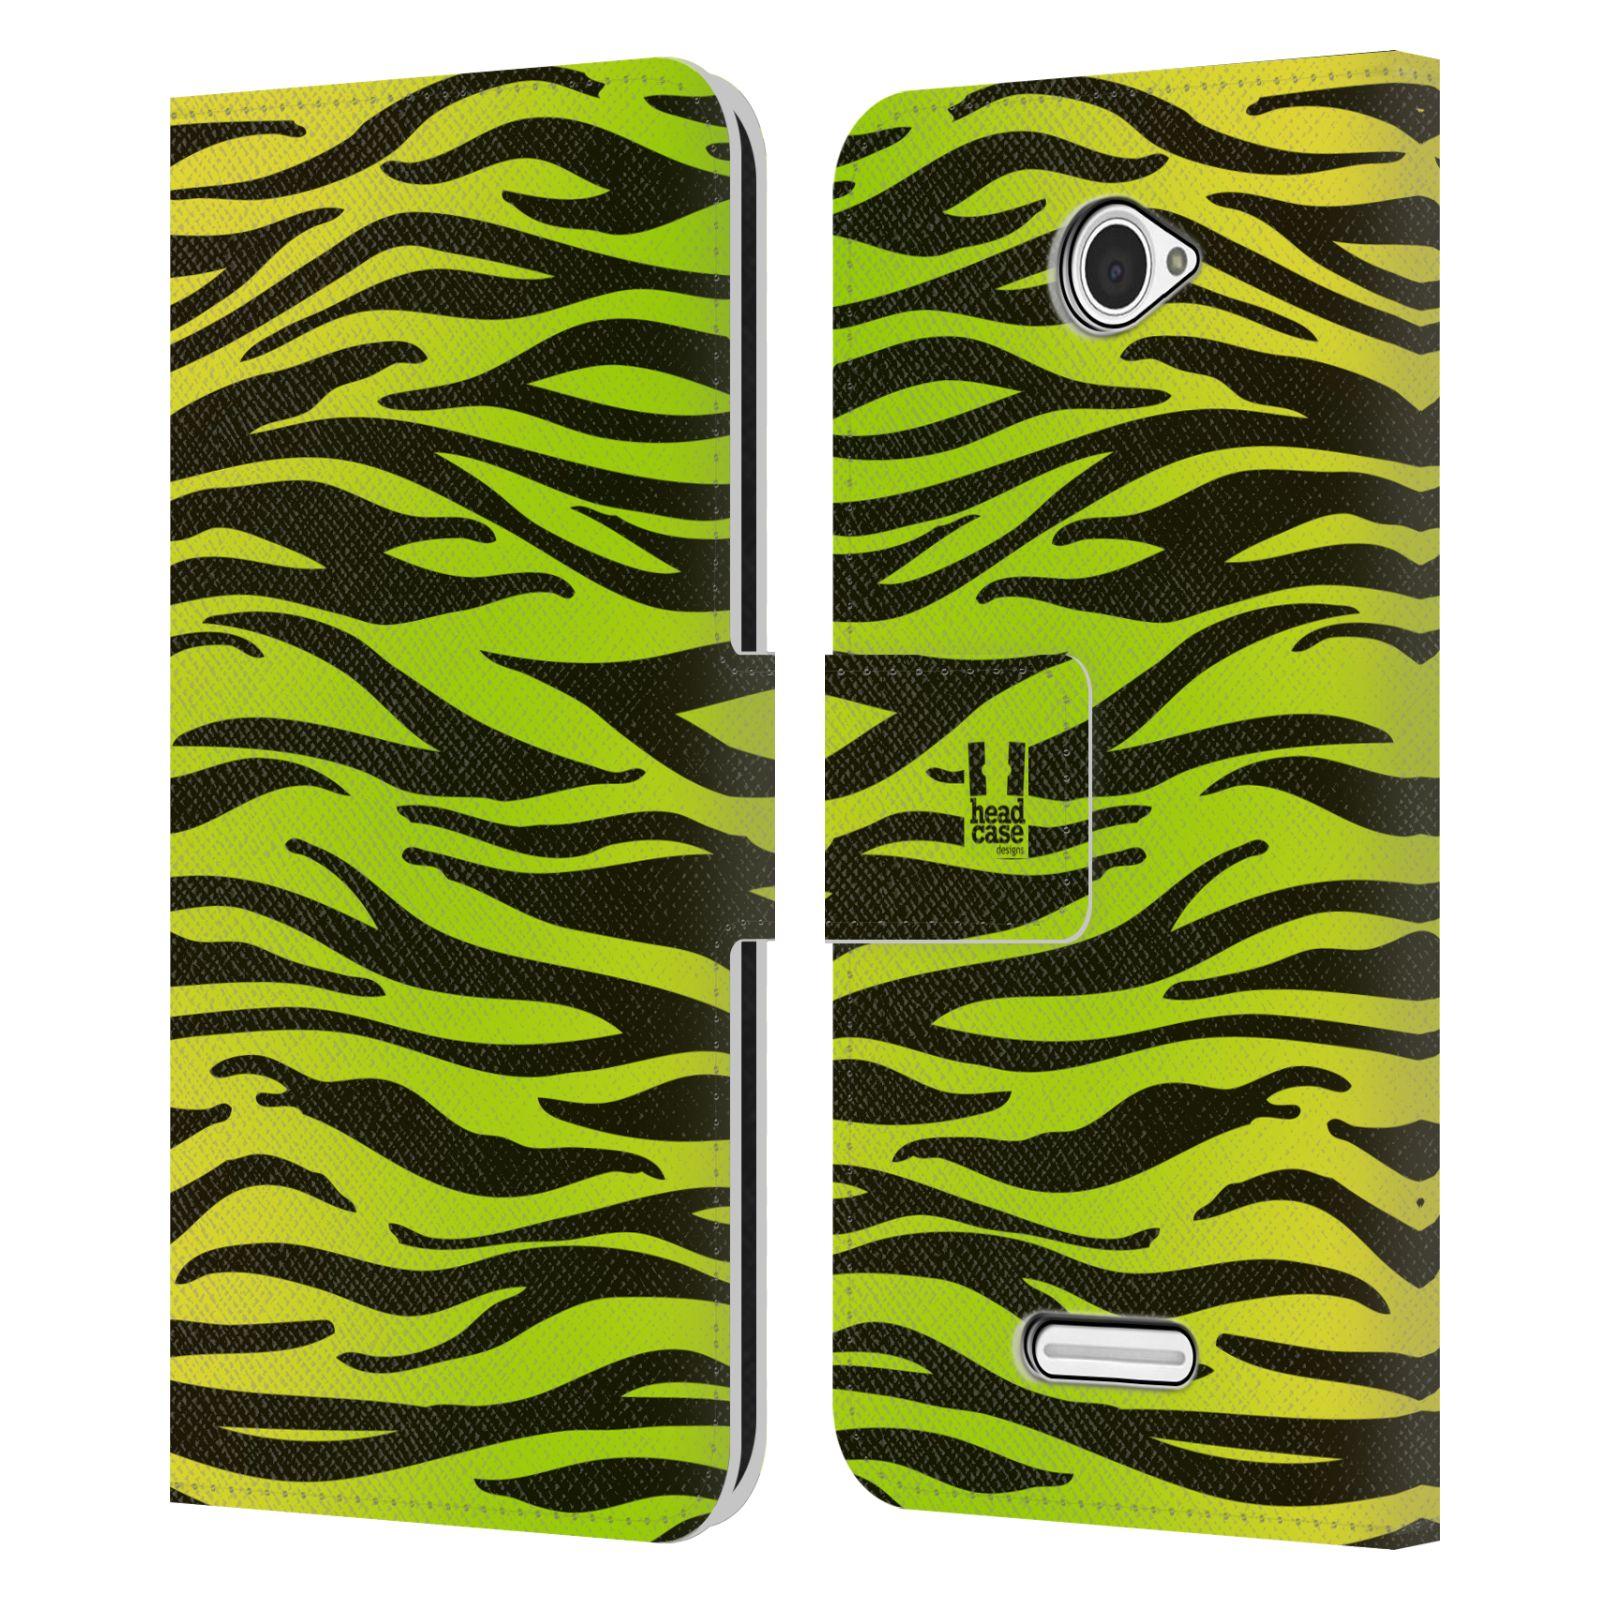 HEAD CASE Flipové pouzdro pro mobil SONY XPERIA E4 Zvířecí barevné vzory žlutozelená zebra